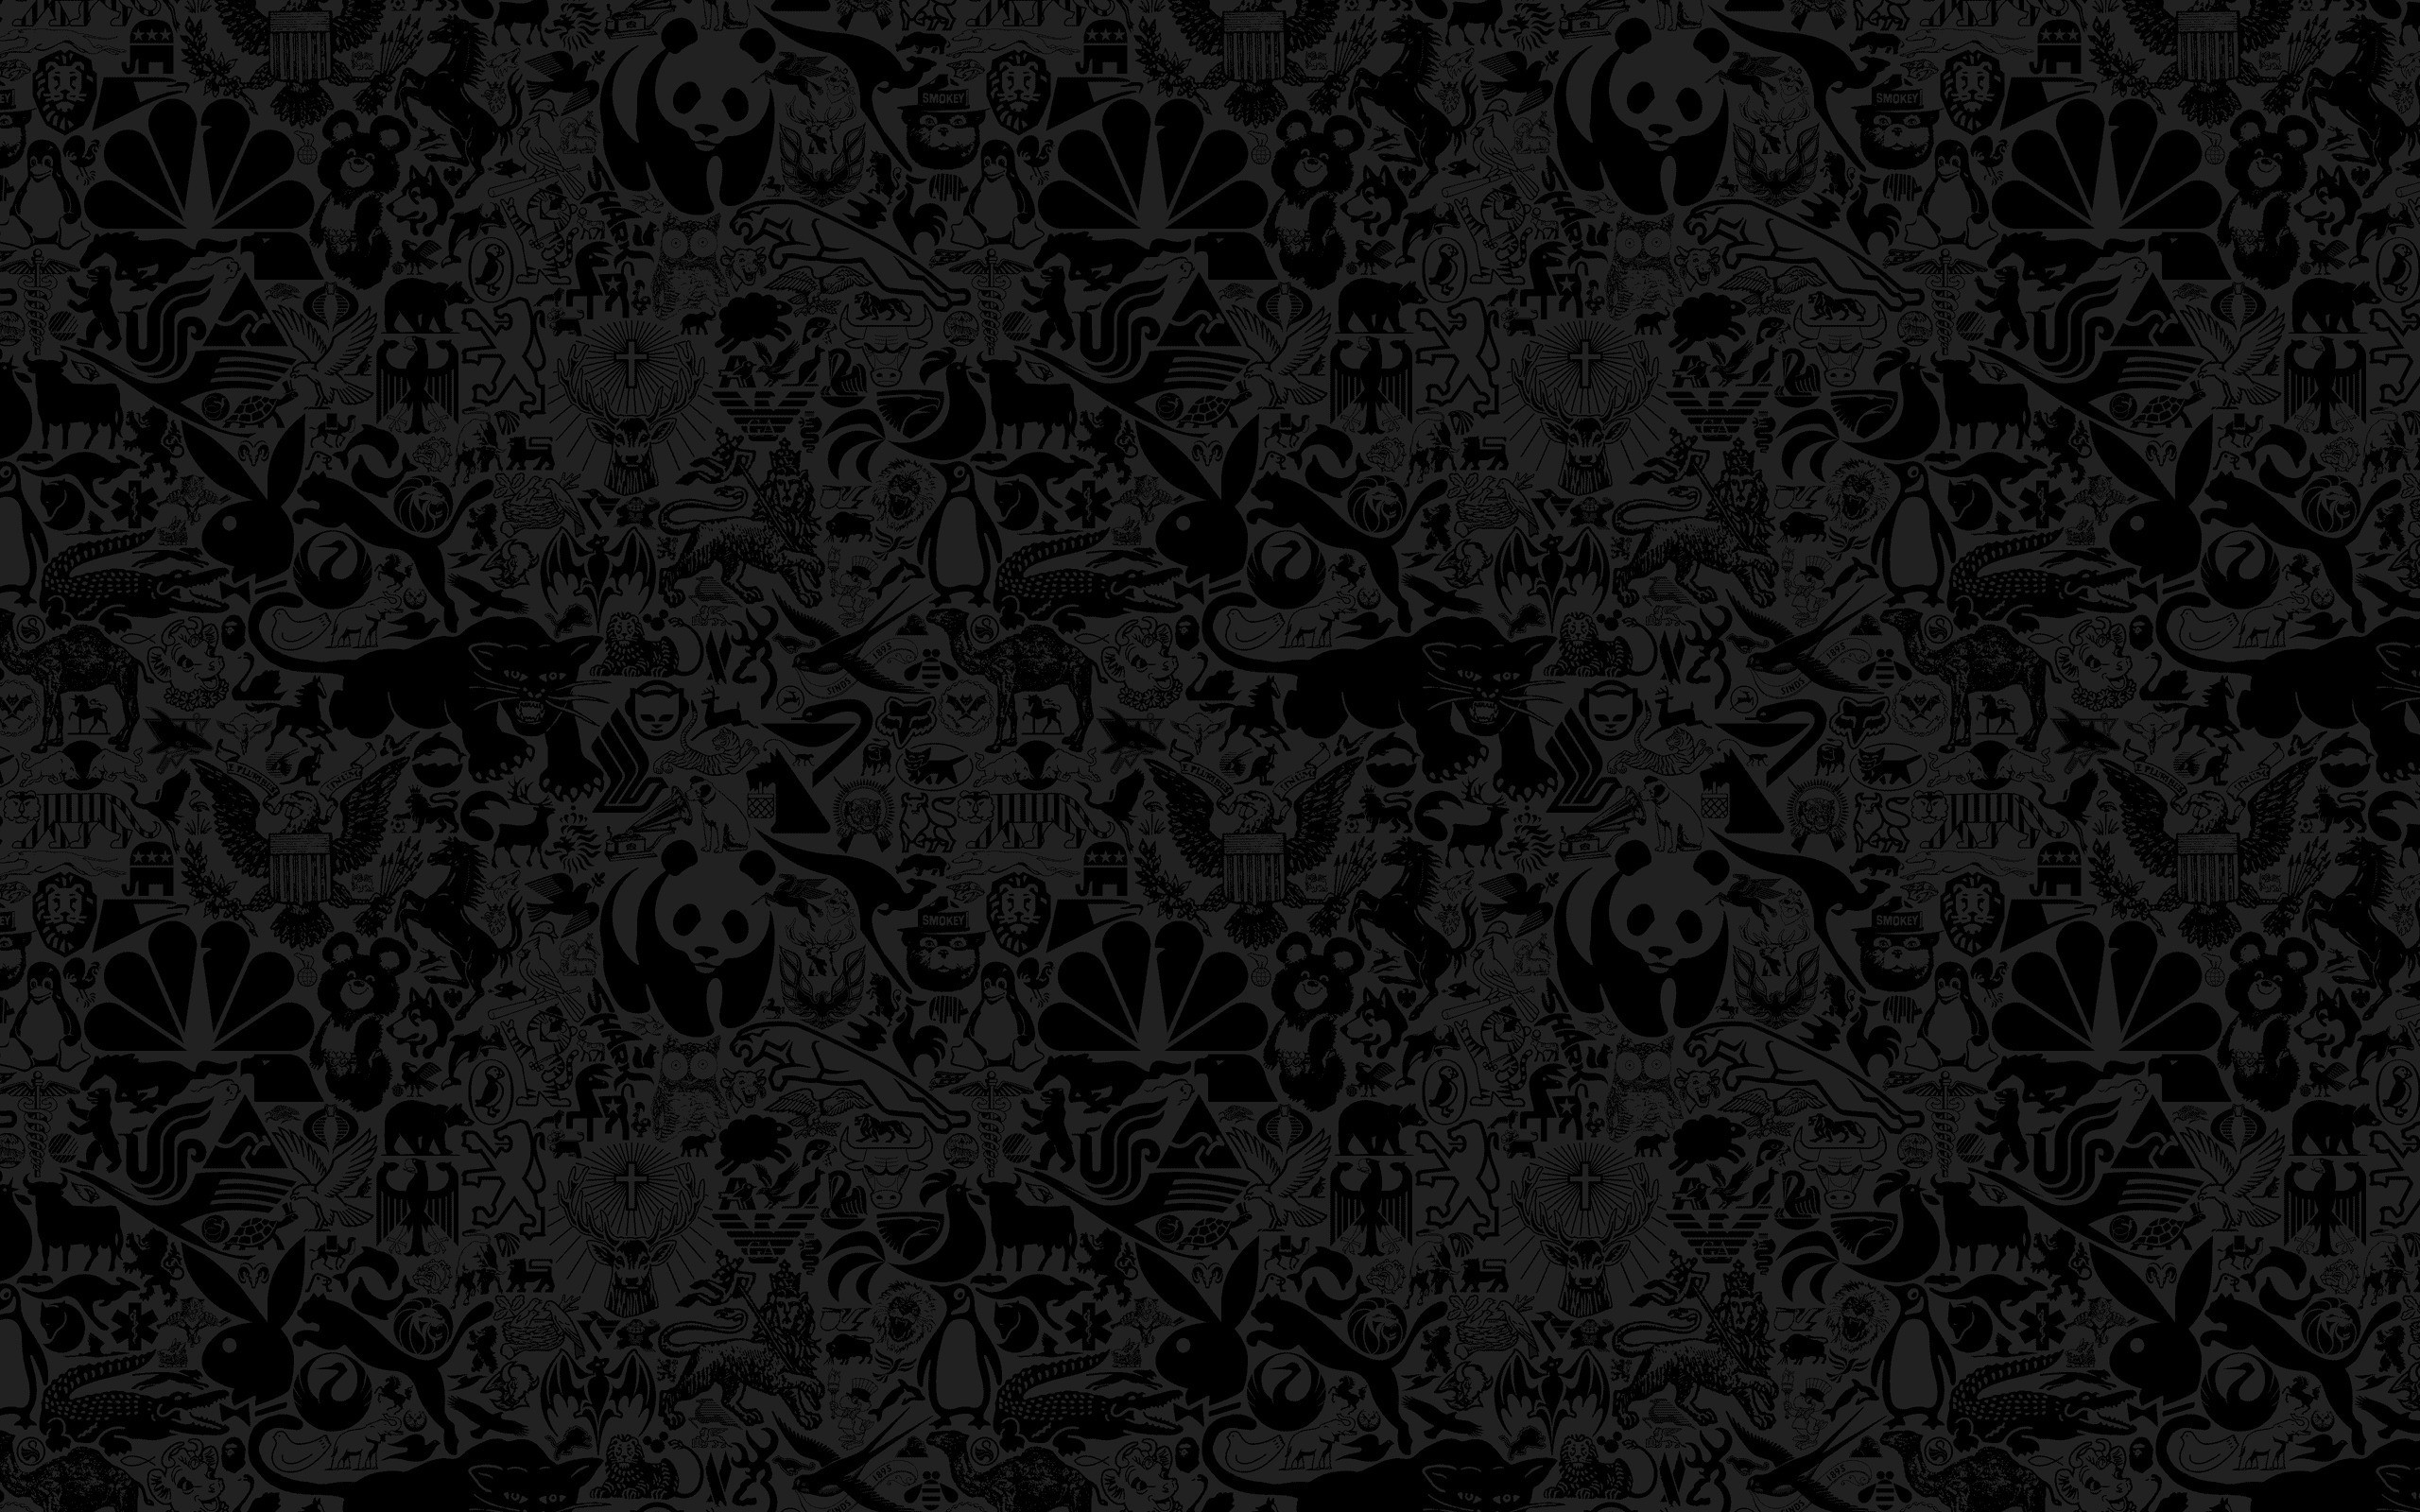 Sfondi neri hd 68 immagini for Sfondi s4 hd